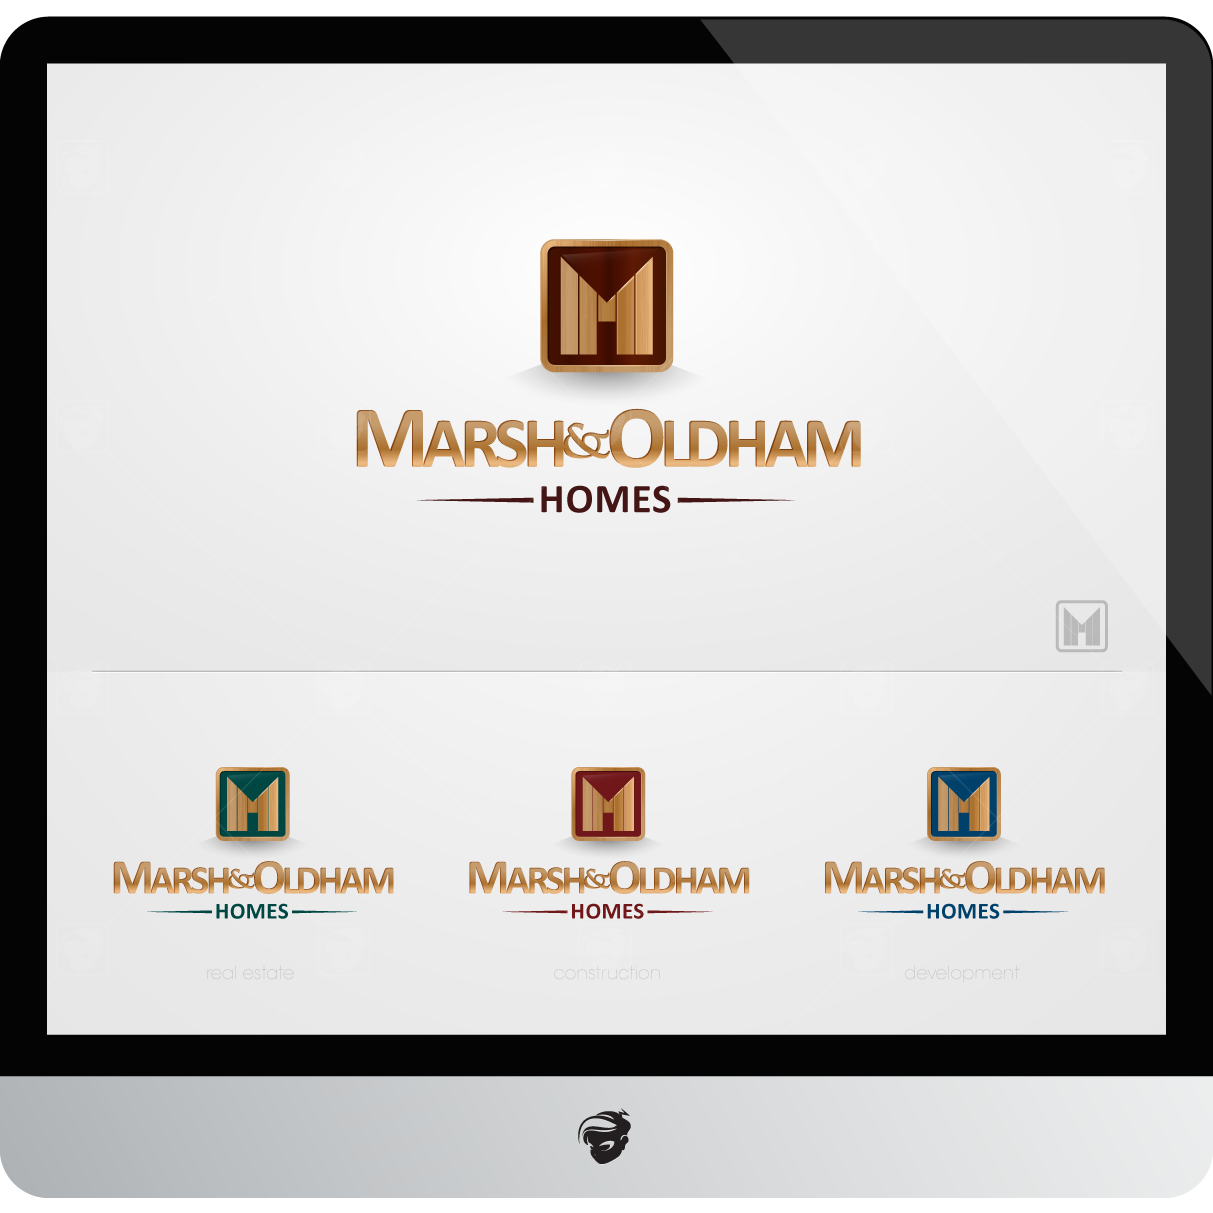 Logo Design by zesthar - Entry No. 53 in the Logo Design Contest Artistic Logo Design for Marsh & Oldham Homes.